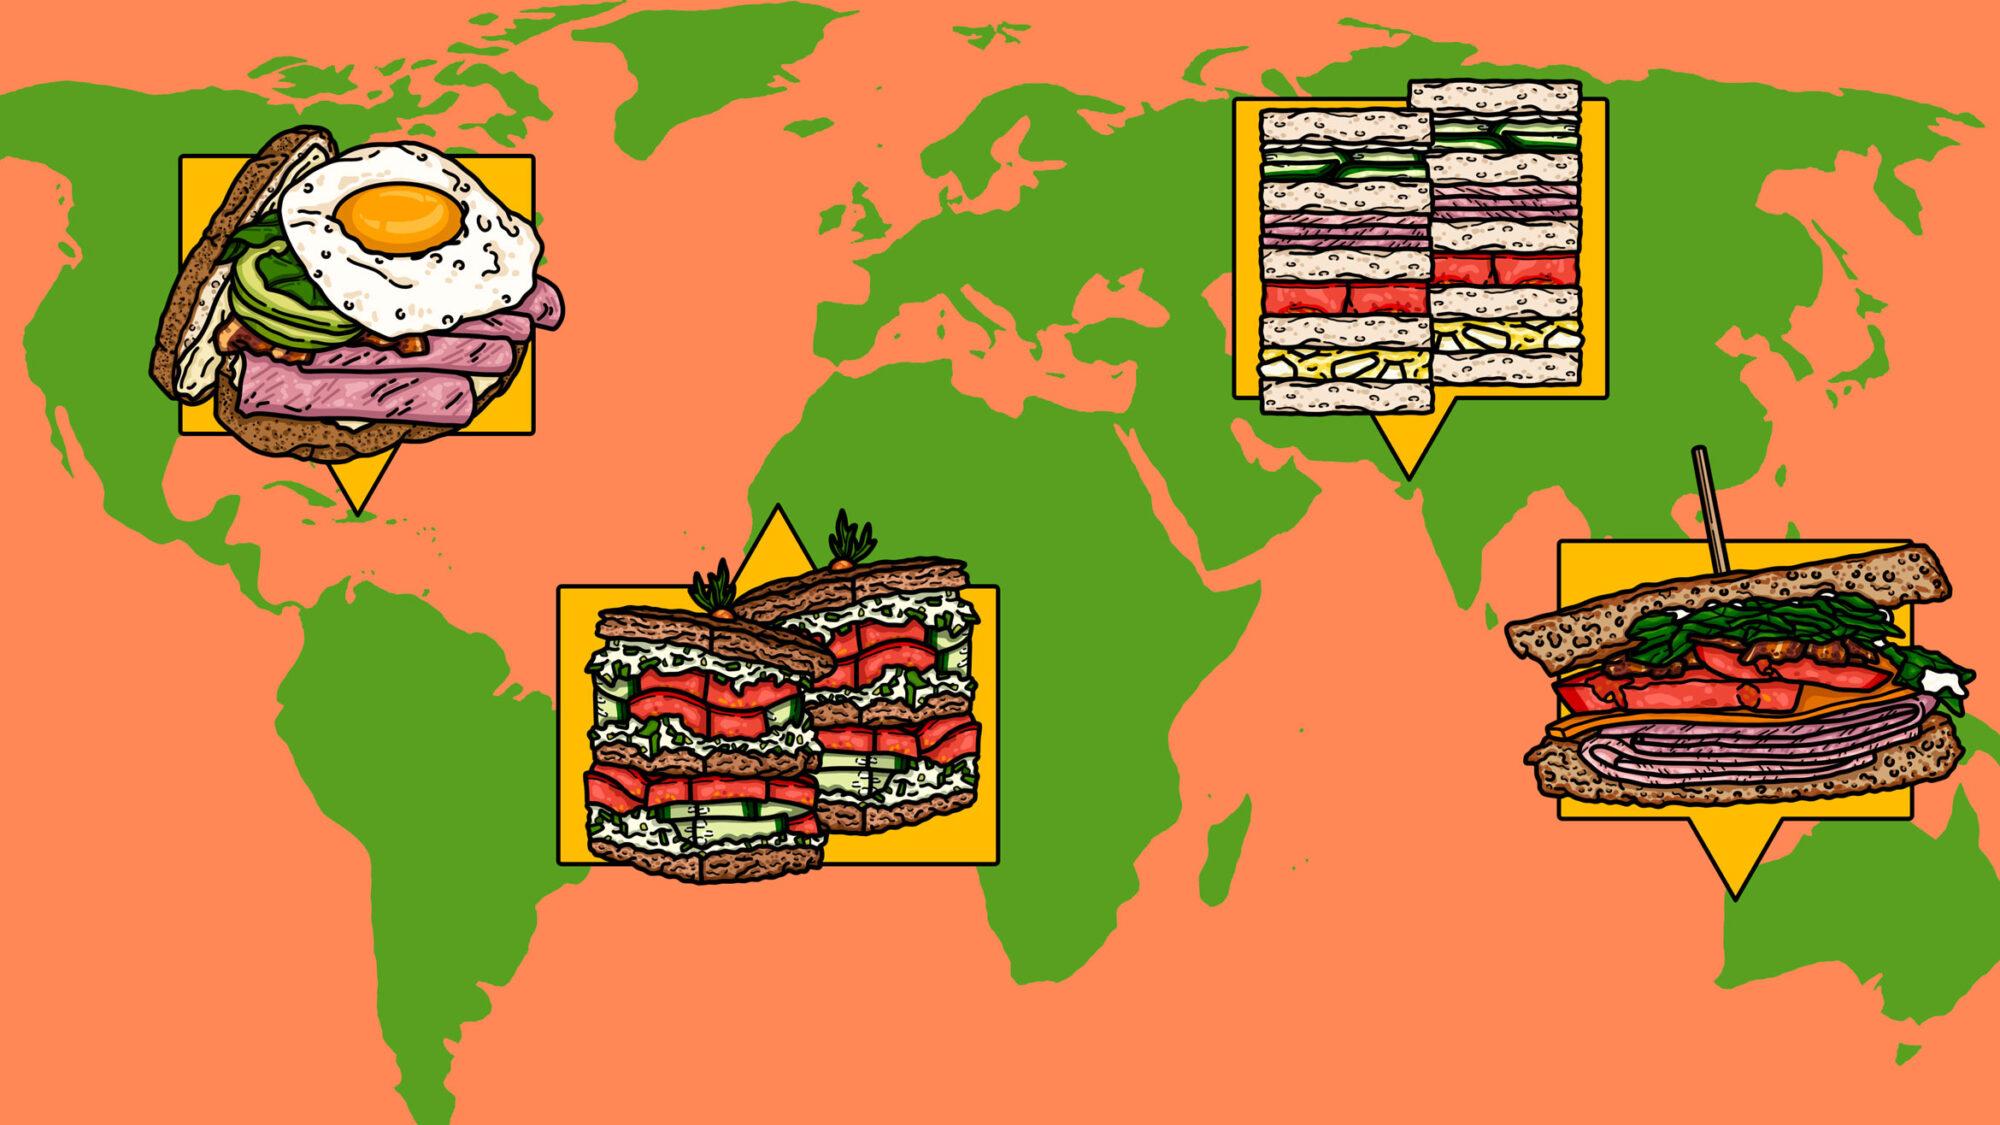 Article-Club-Sandwich-Reviews